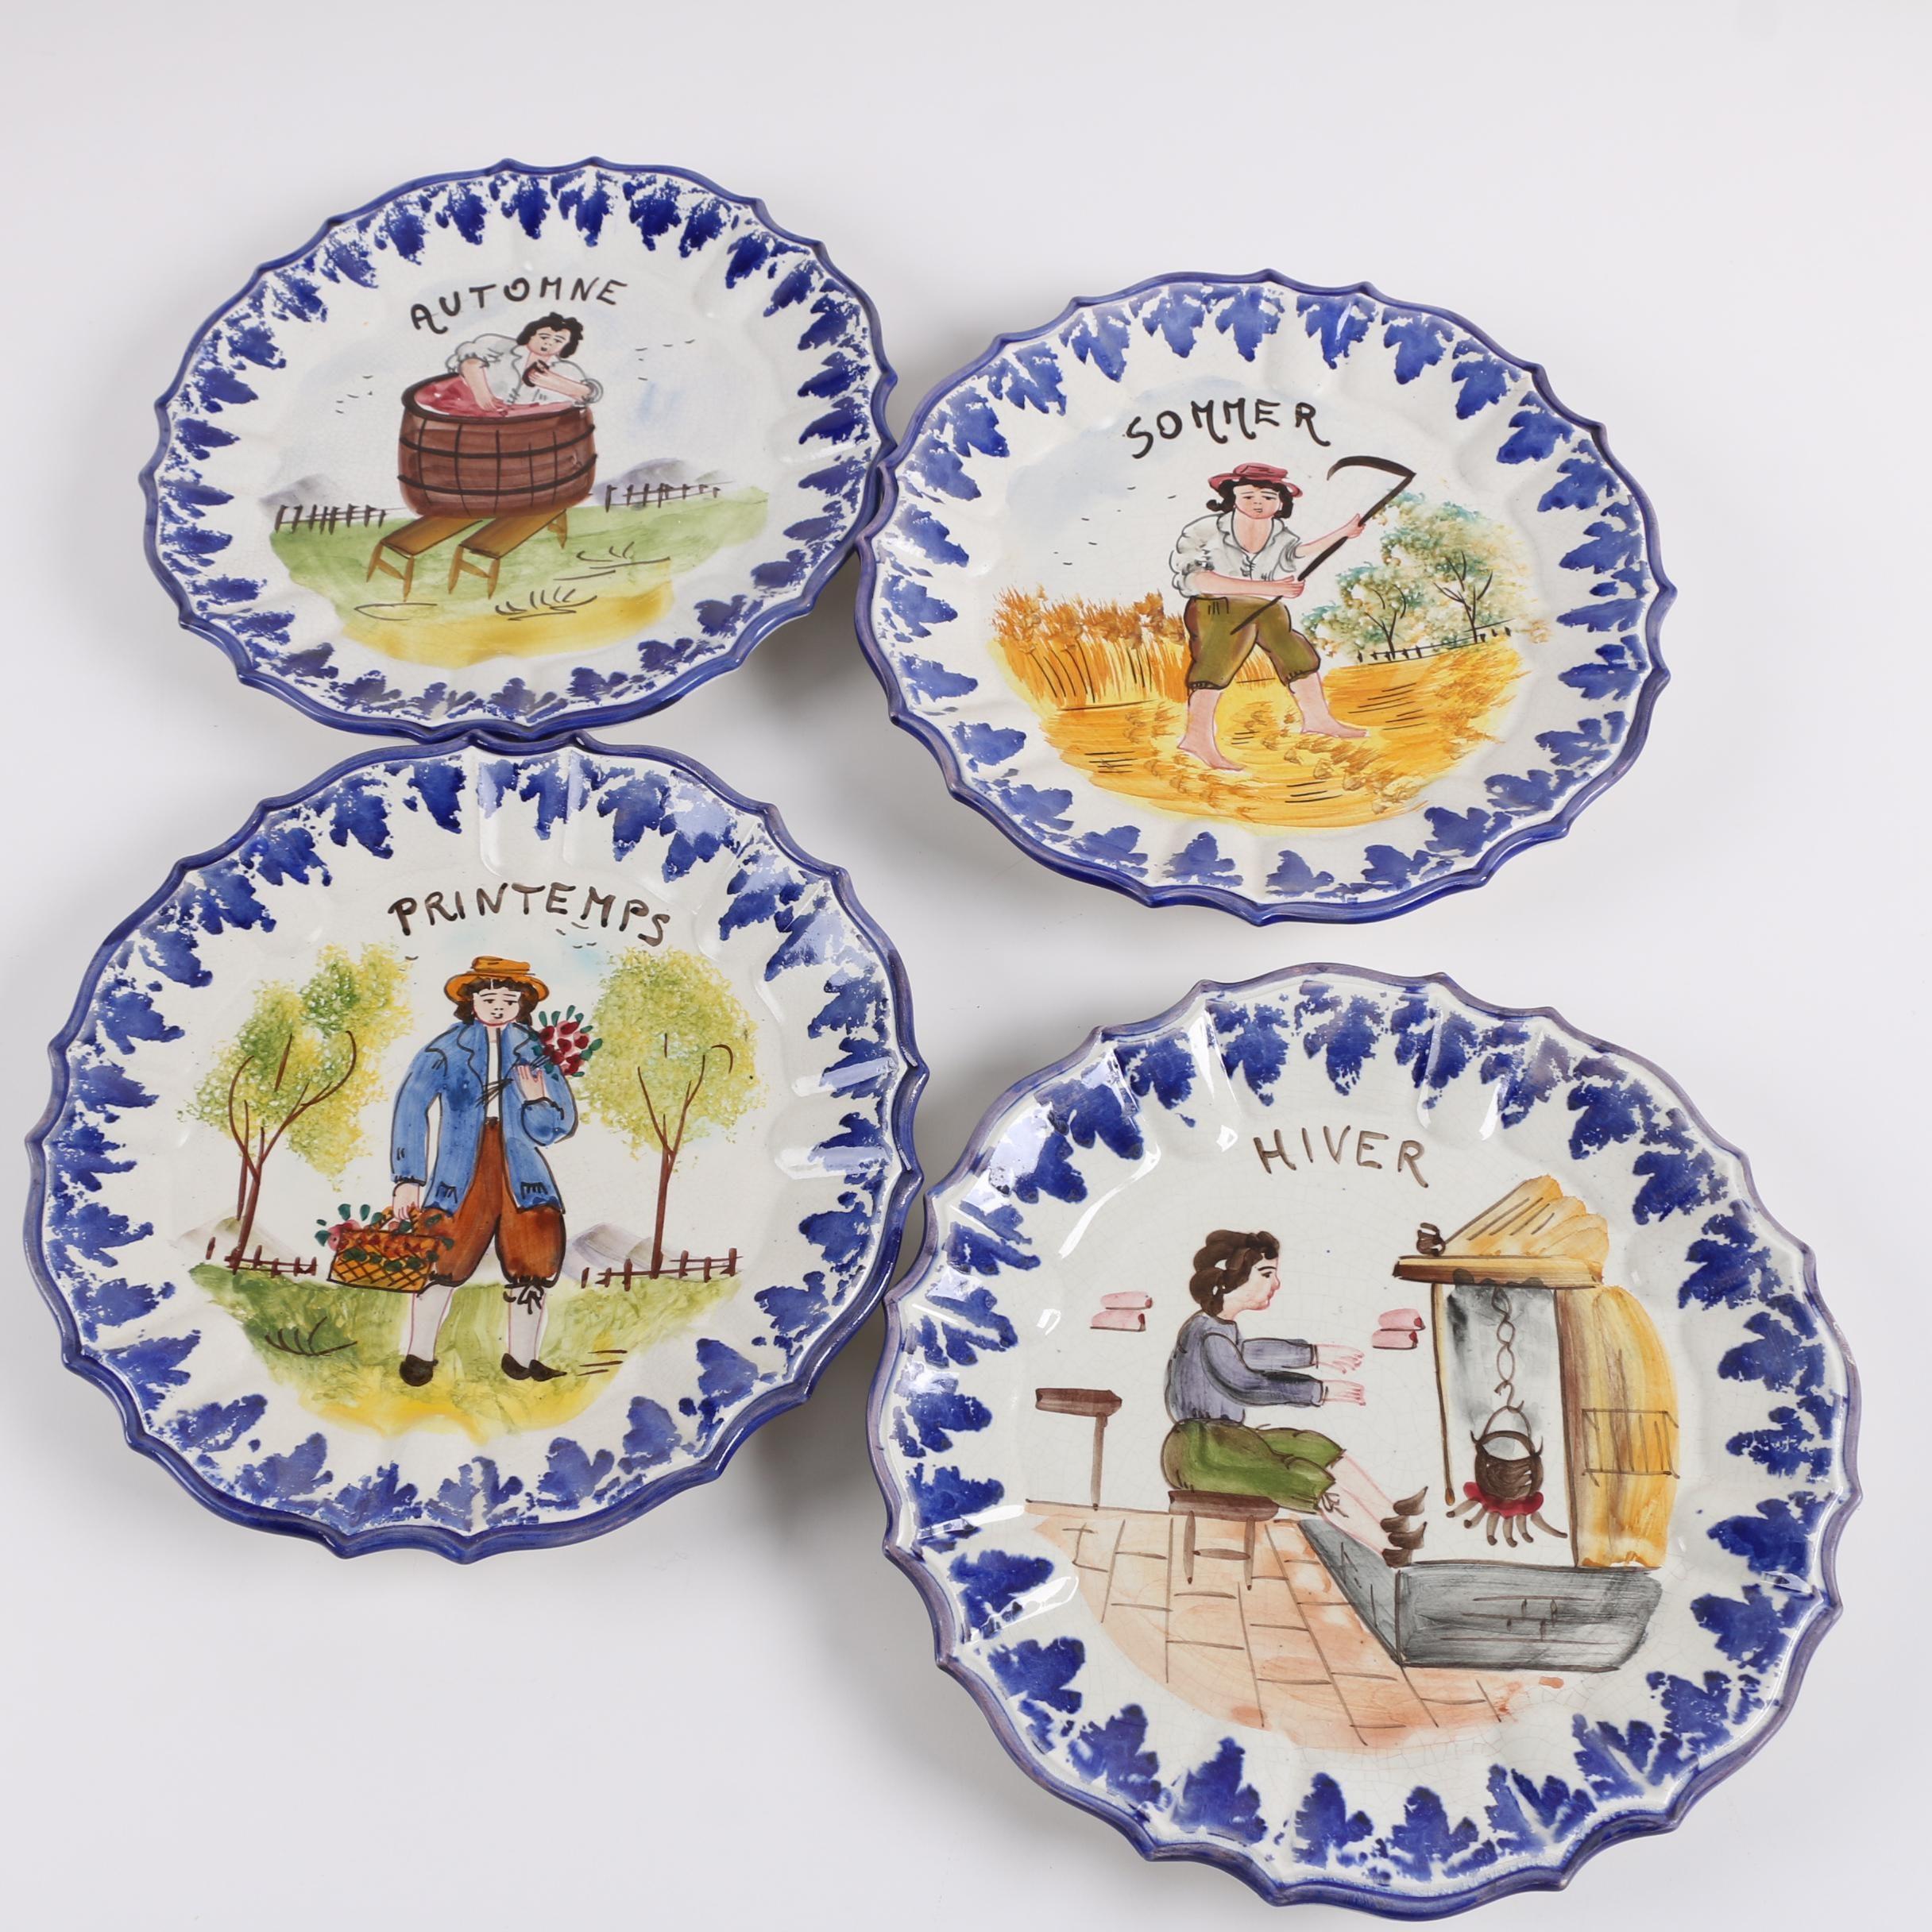 Italian Hand-Painted  Vecchia Bassano Ceramic Plates of the Four Seasons